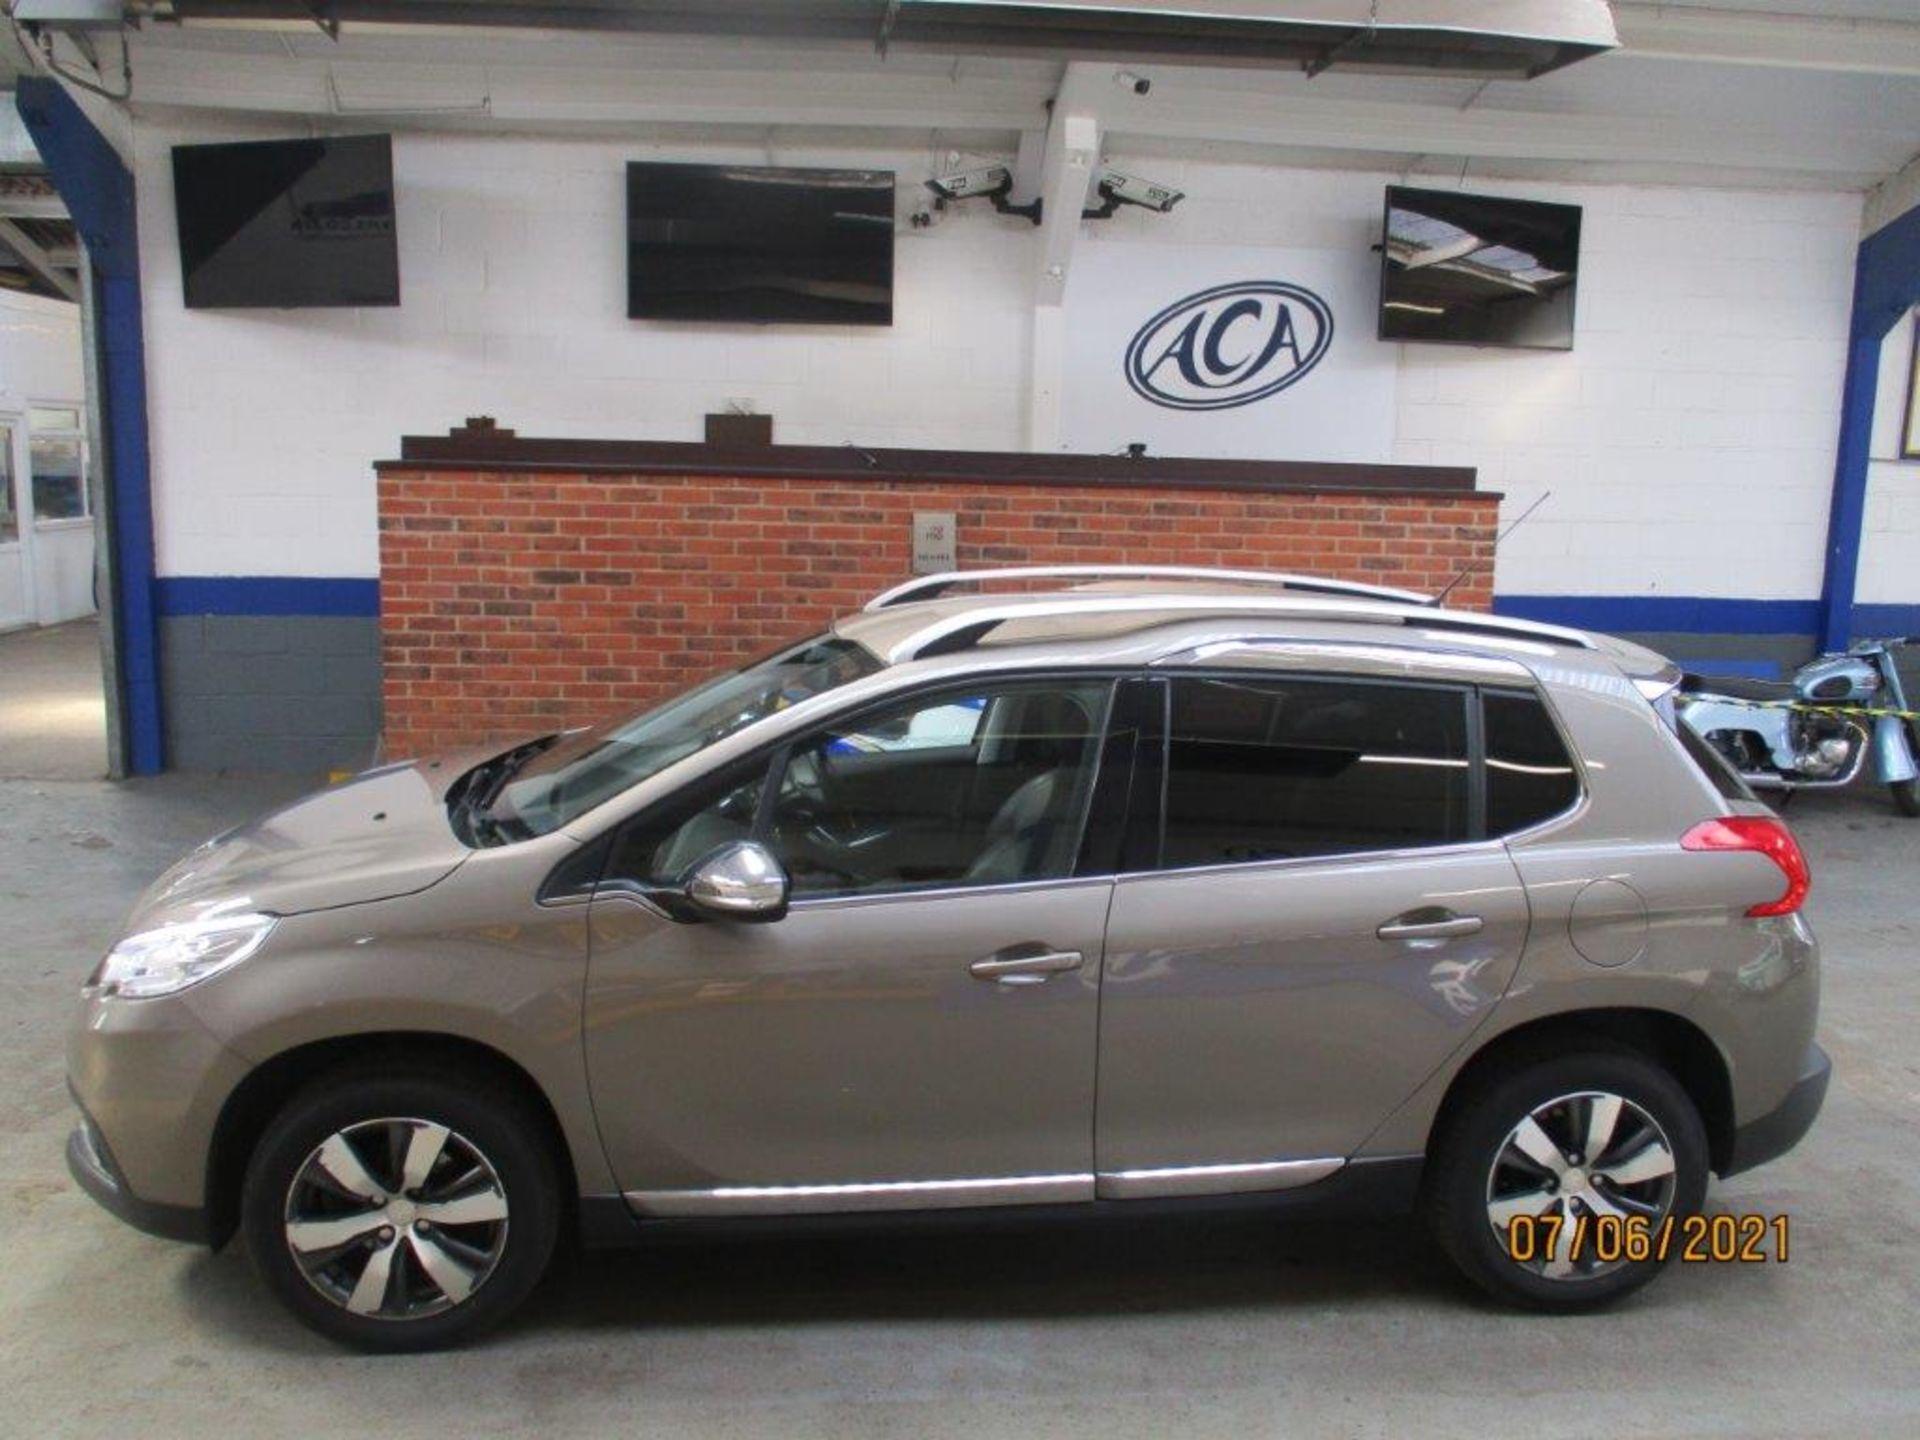 64 15 Peugeot 2008 Allure E-HDI - Image 2 of 25